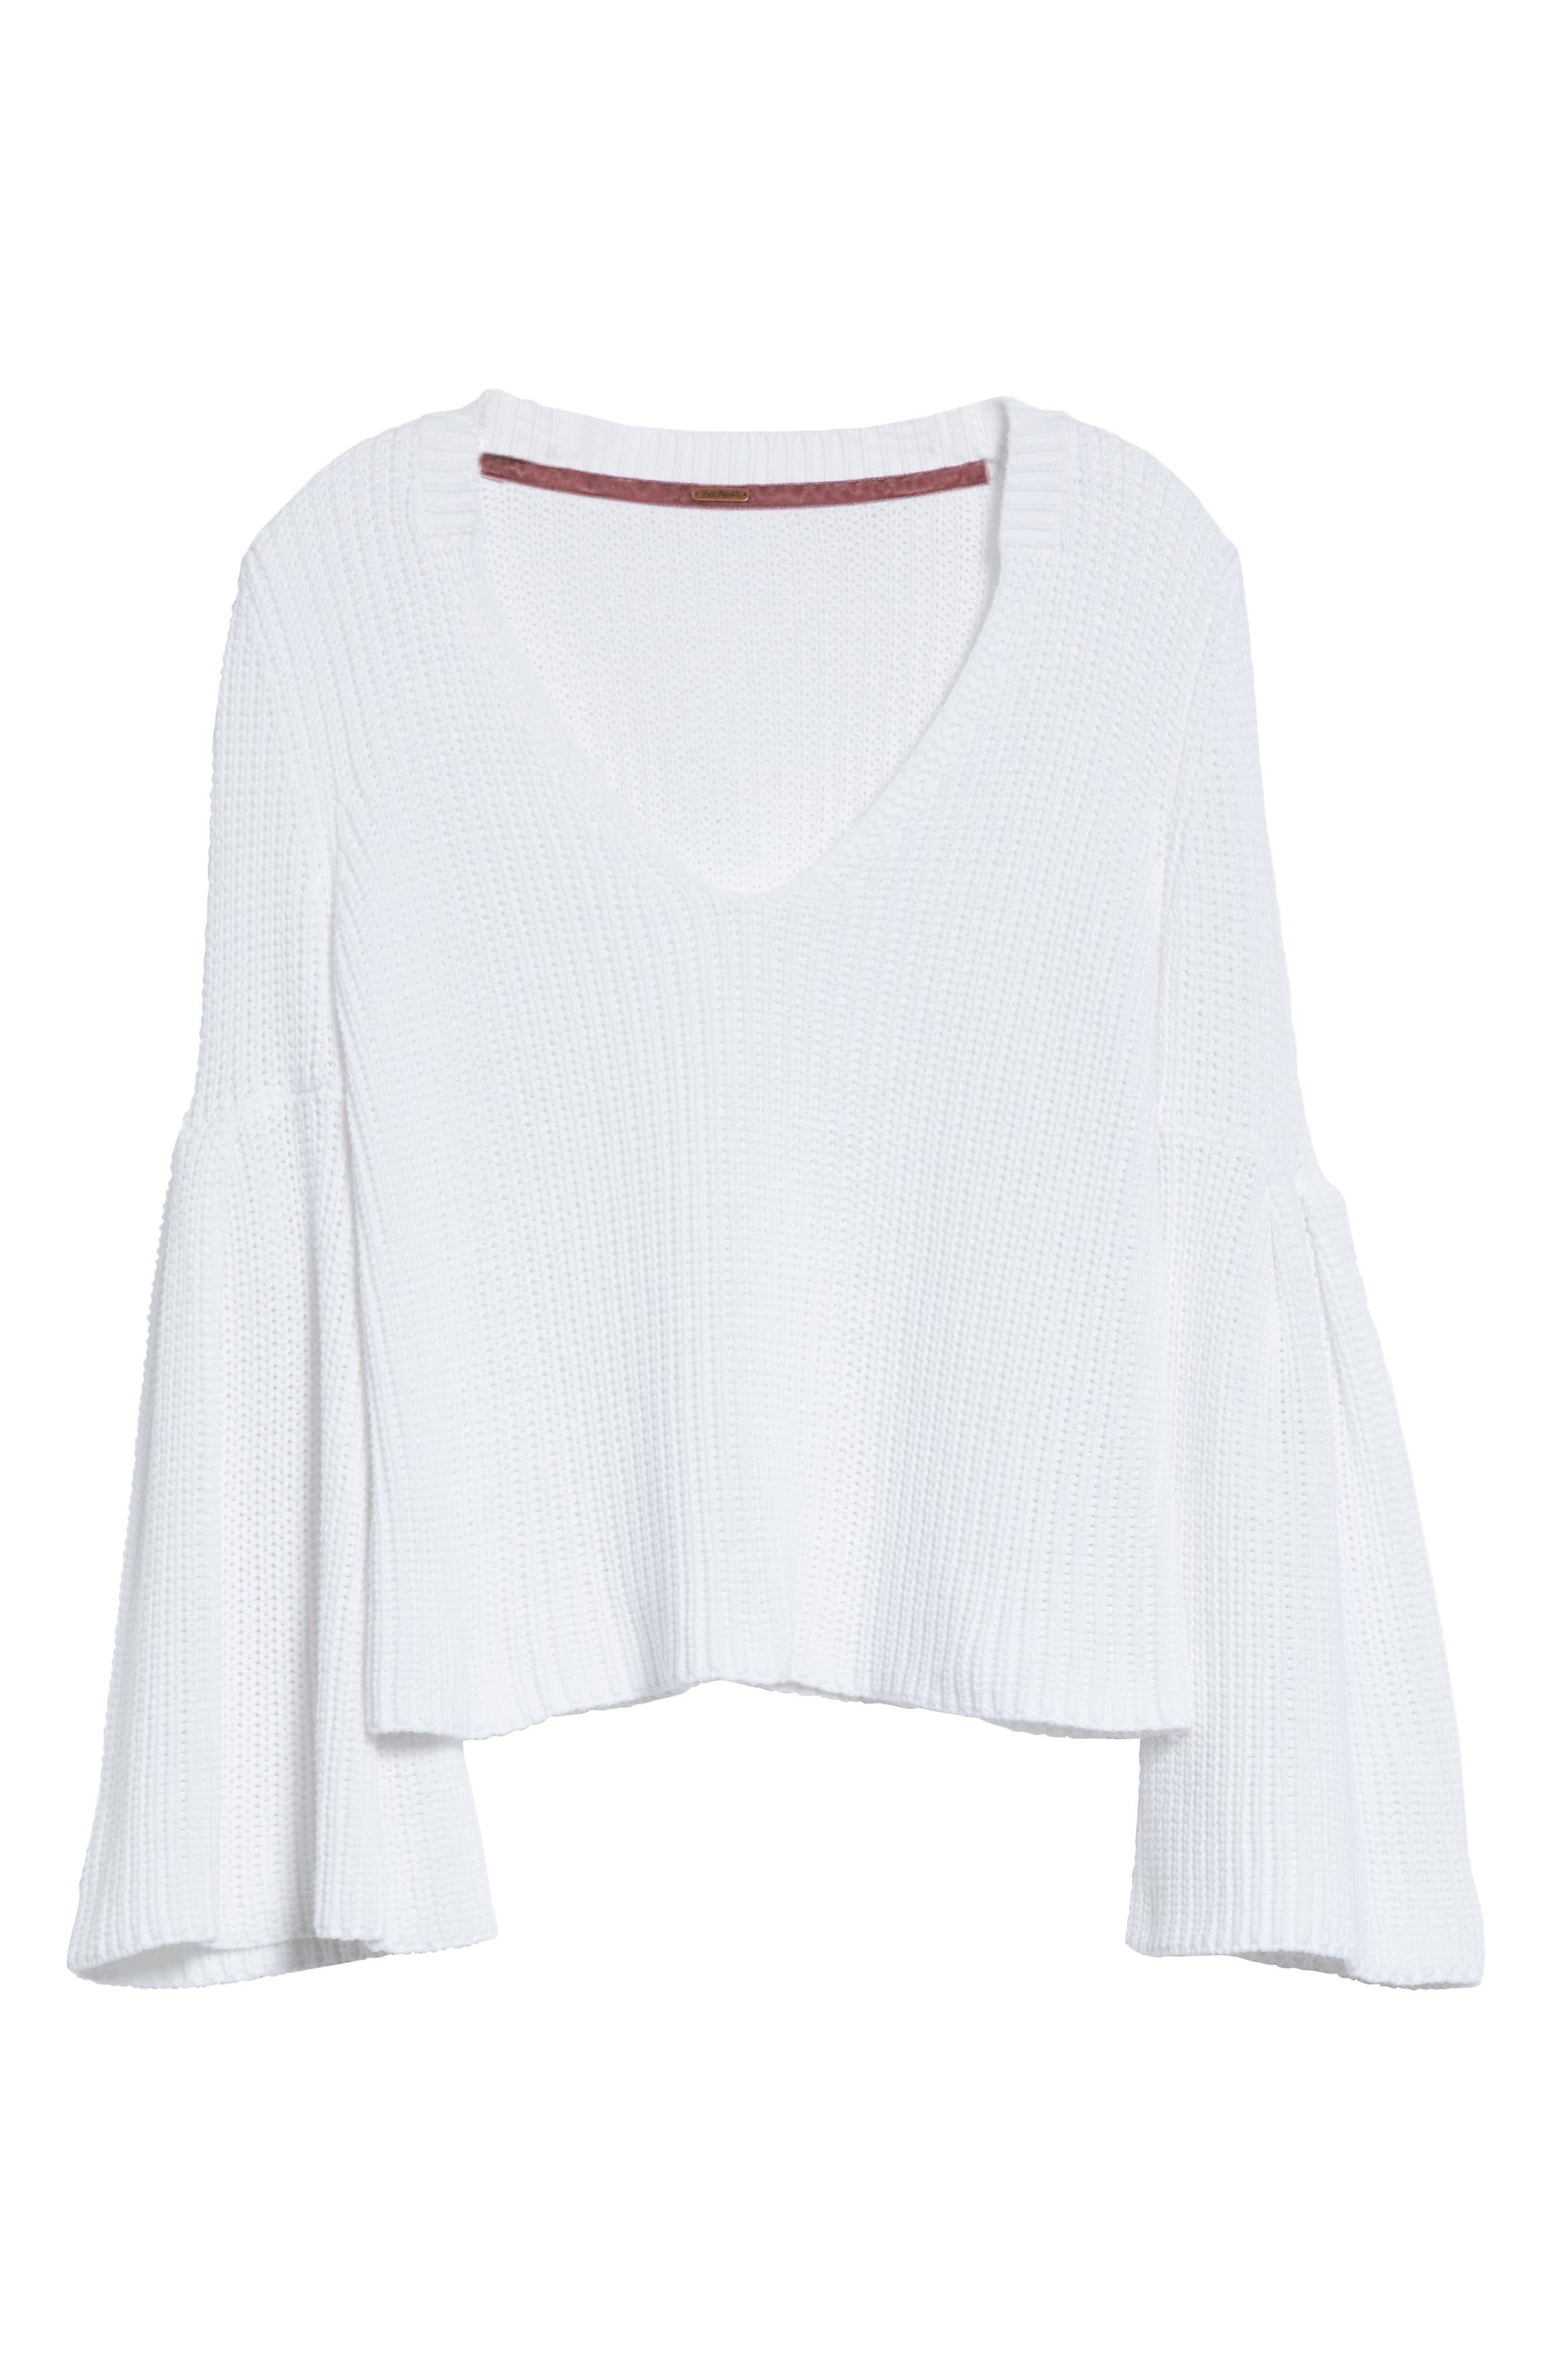 Damsel Bell Sleeve Pullover,                             Alternate thumbnail 23, color,